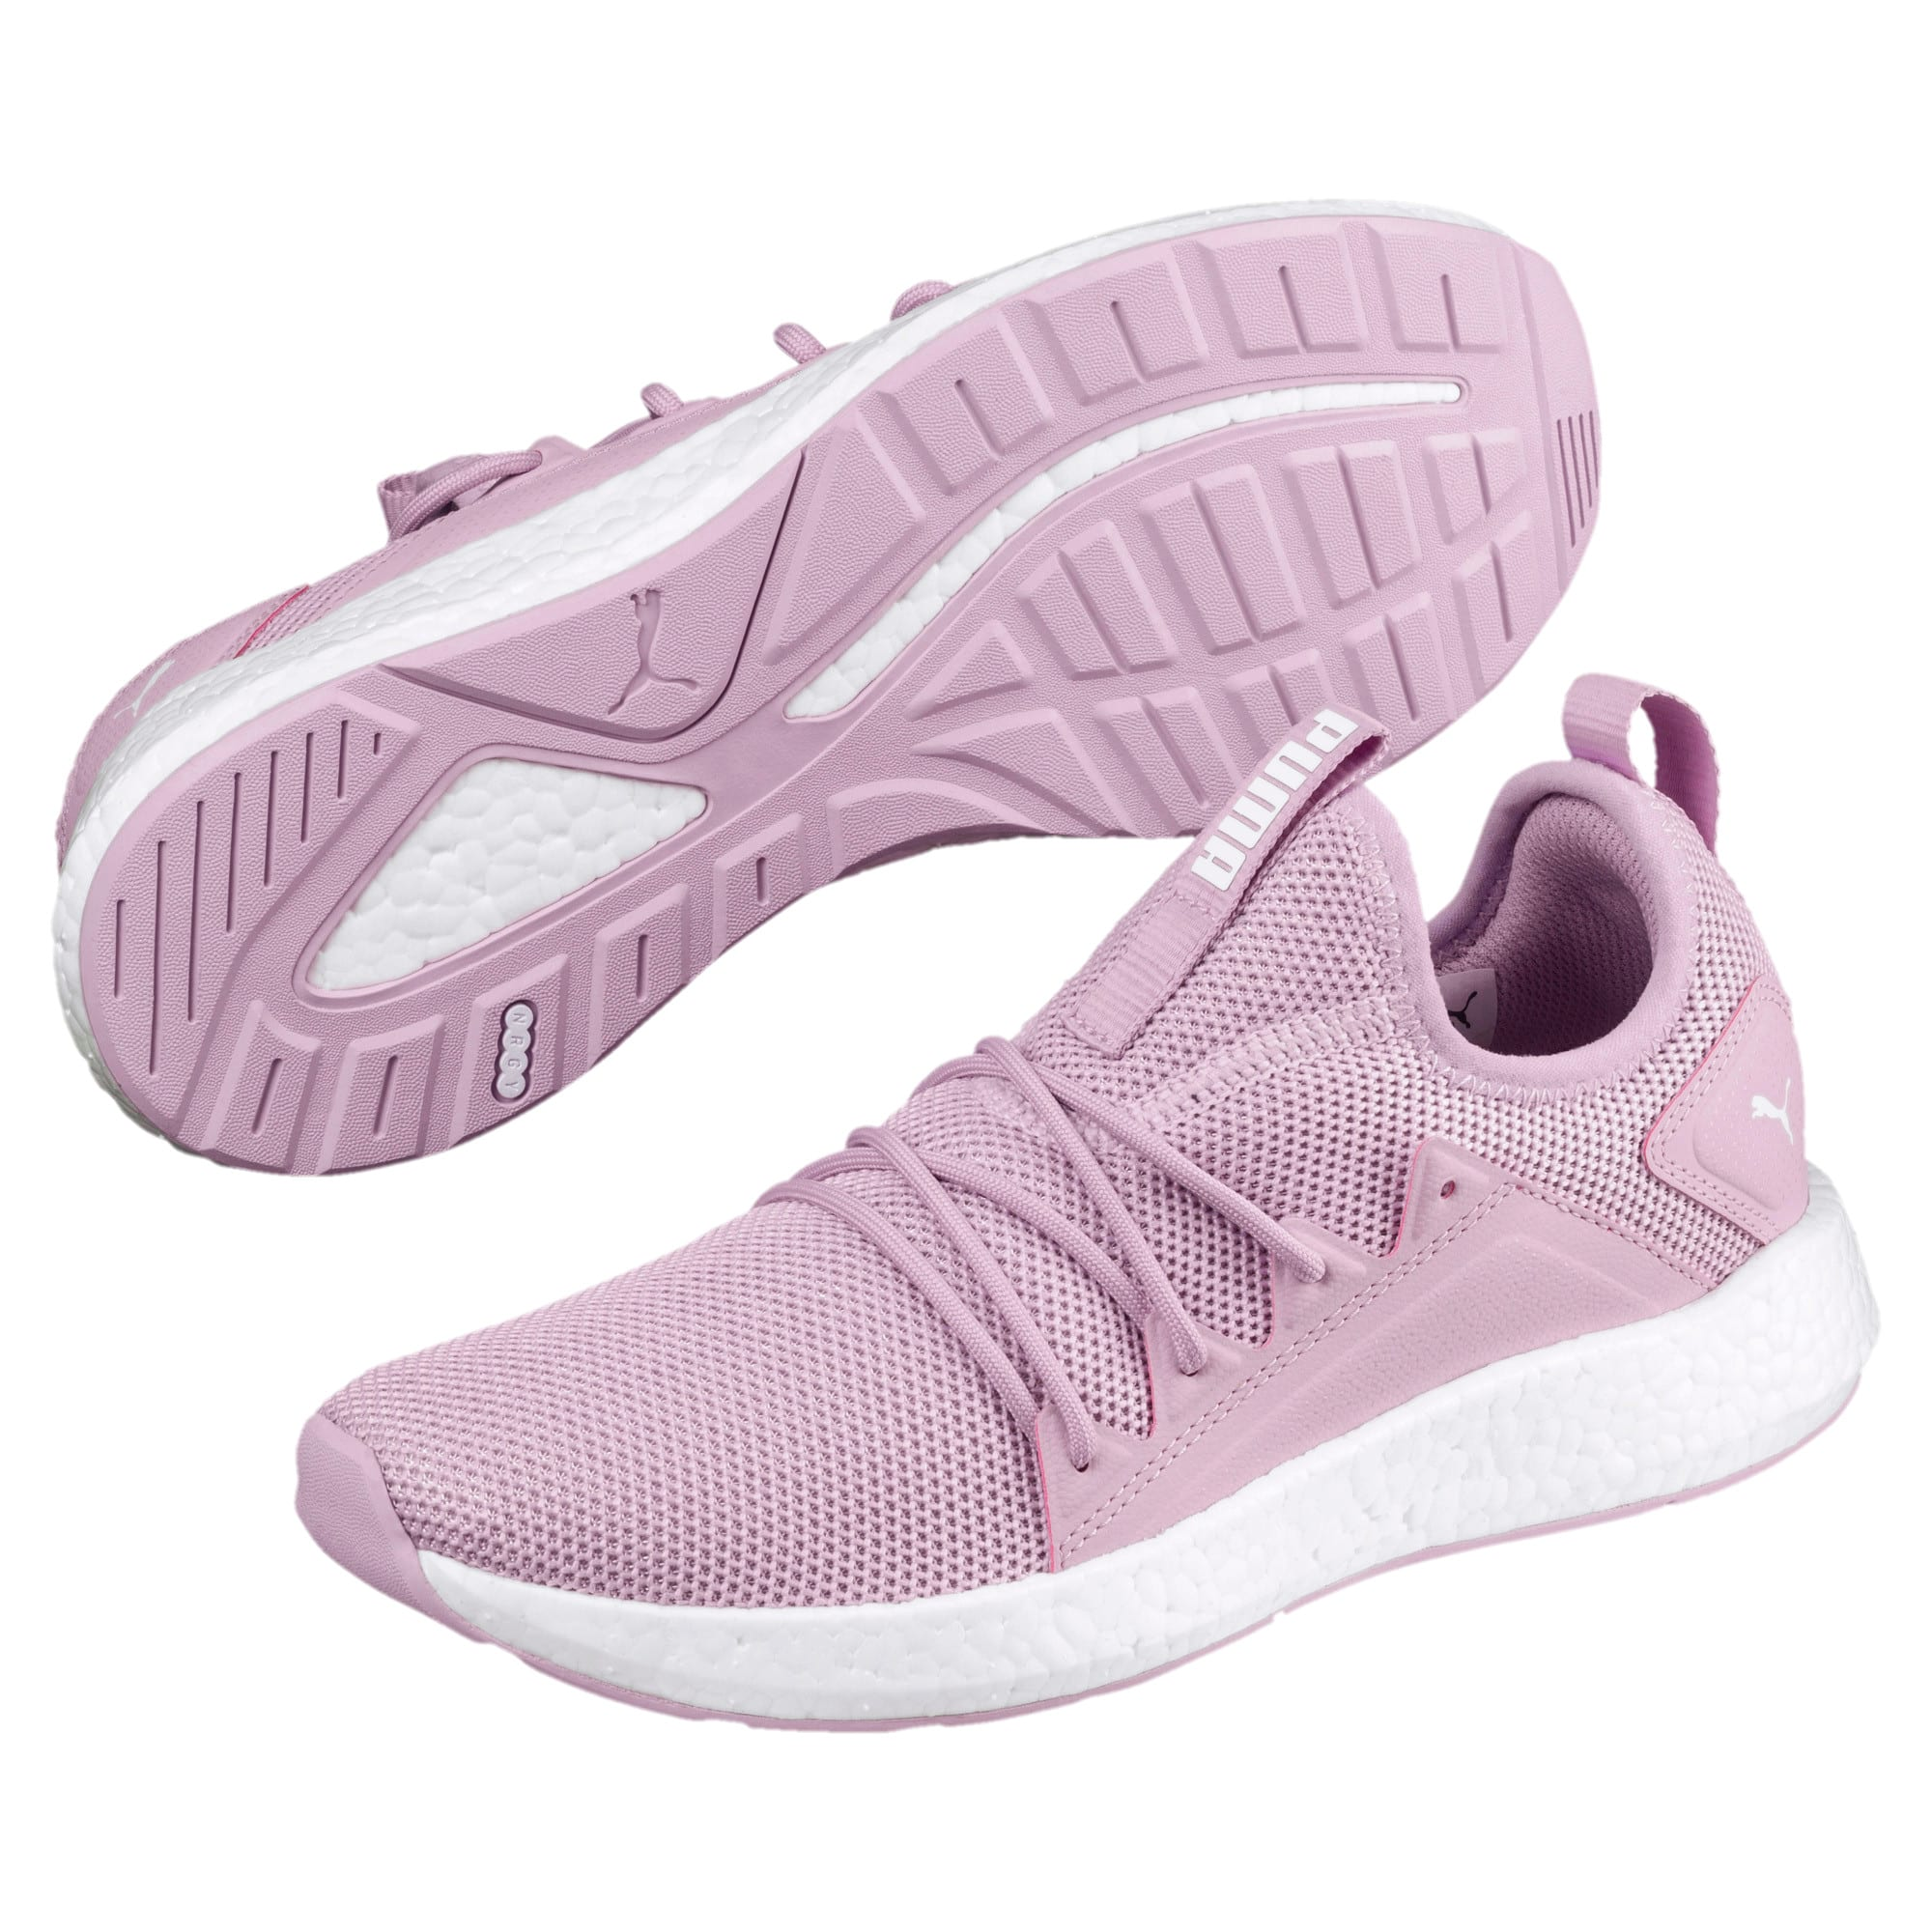 Thumbnail 2 of NRGY Neko Women's Running Shoes, Winsome Orchid-Puma White, medium